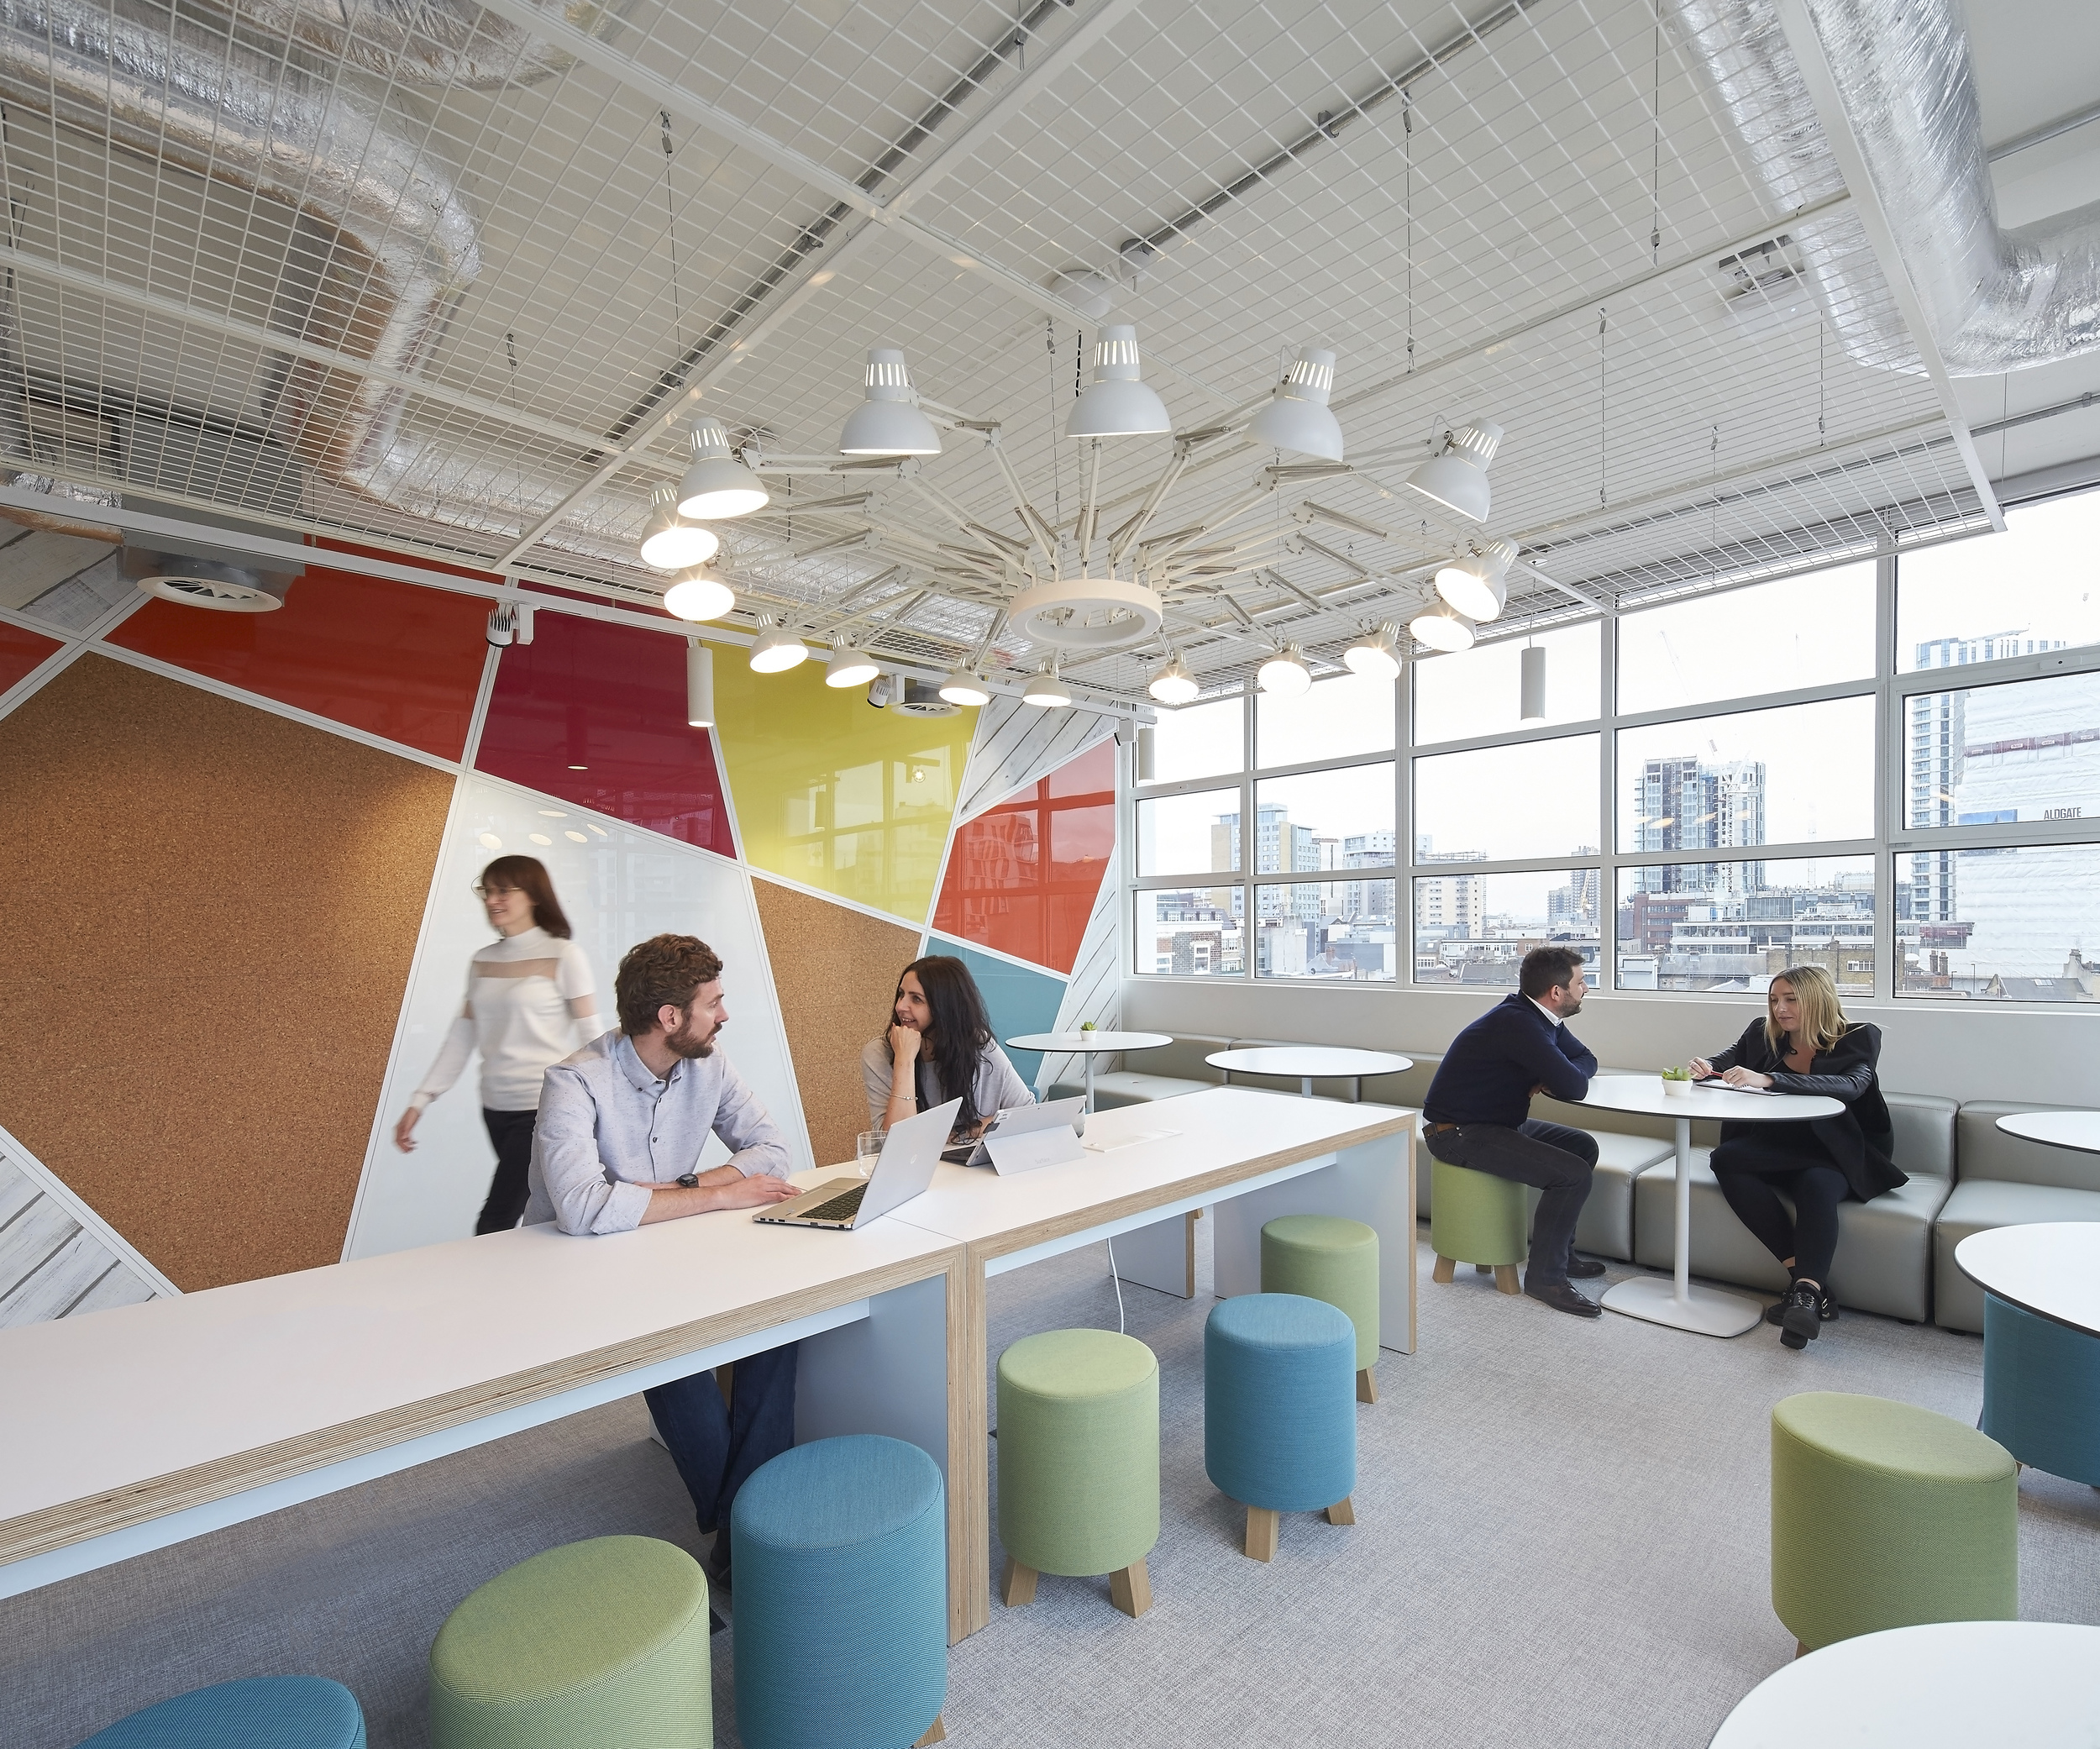 HLW_SKY offices_Brick Lane_-®Hufton+Crow_007.jpg